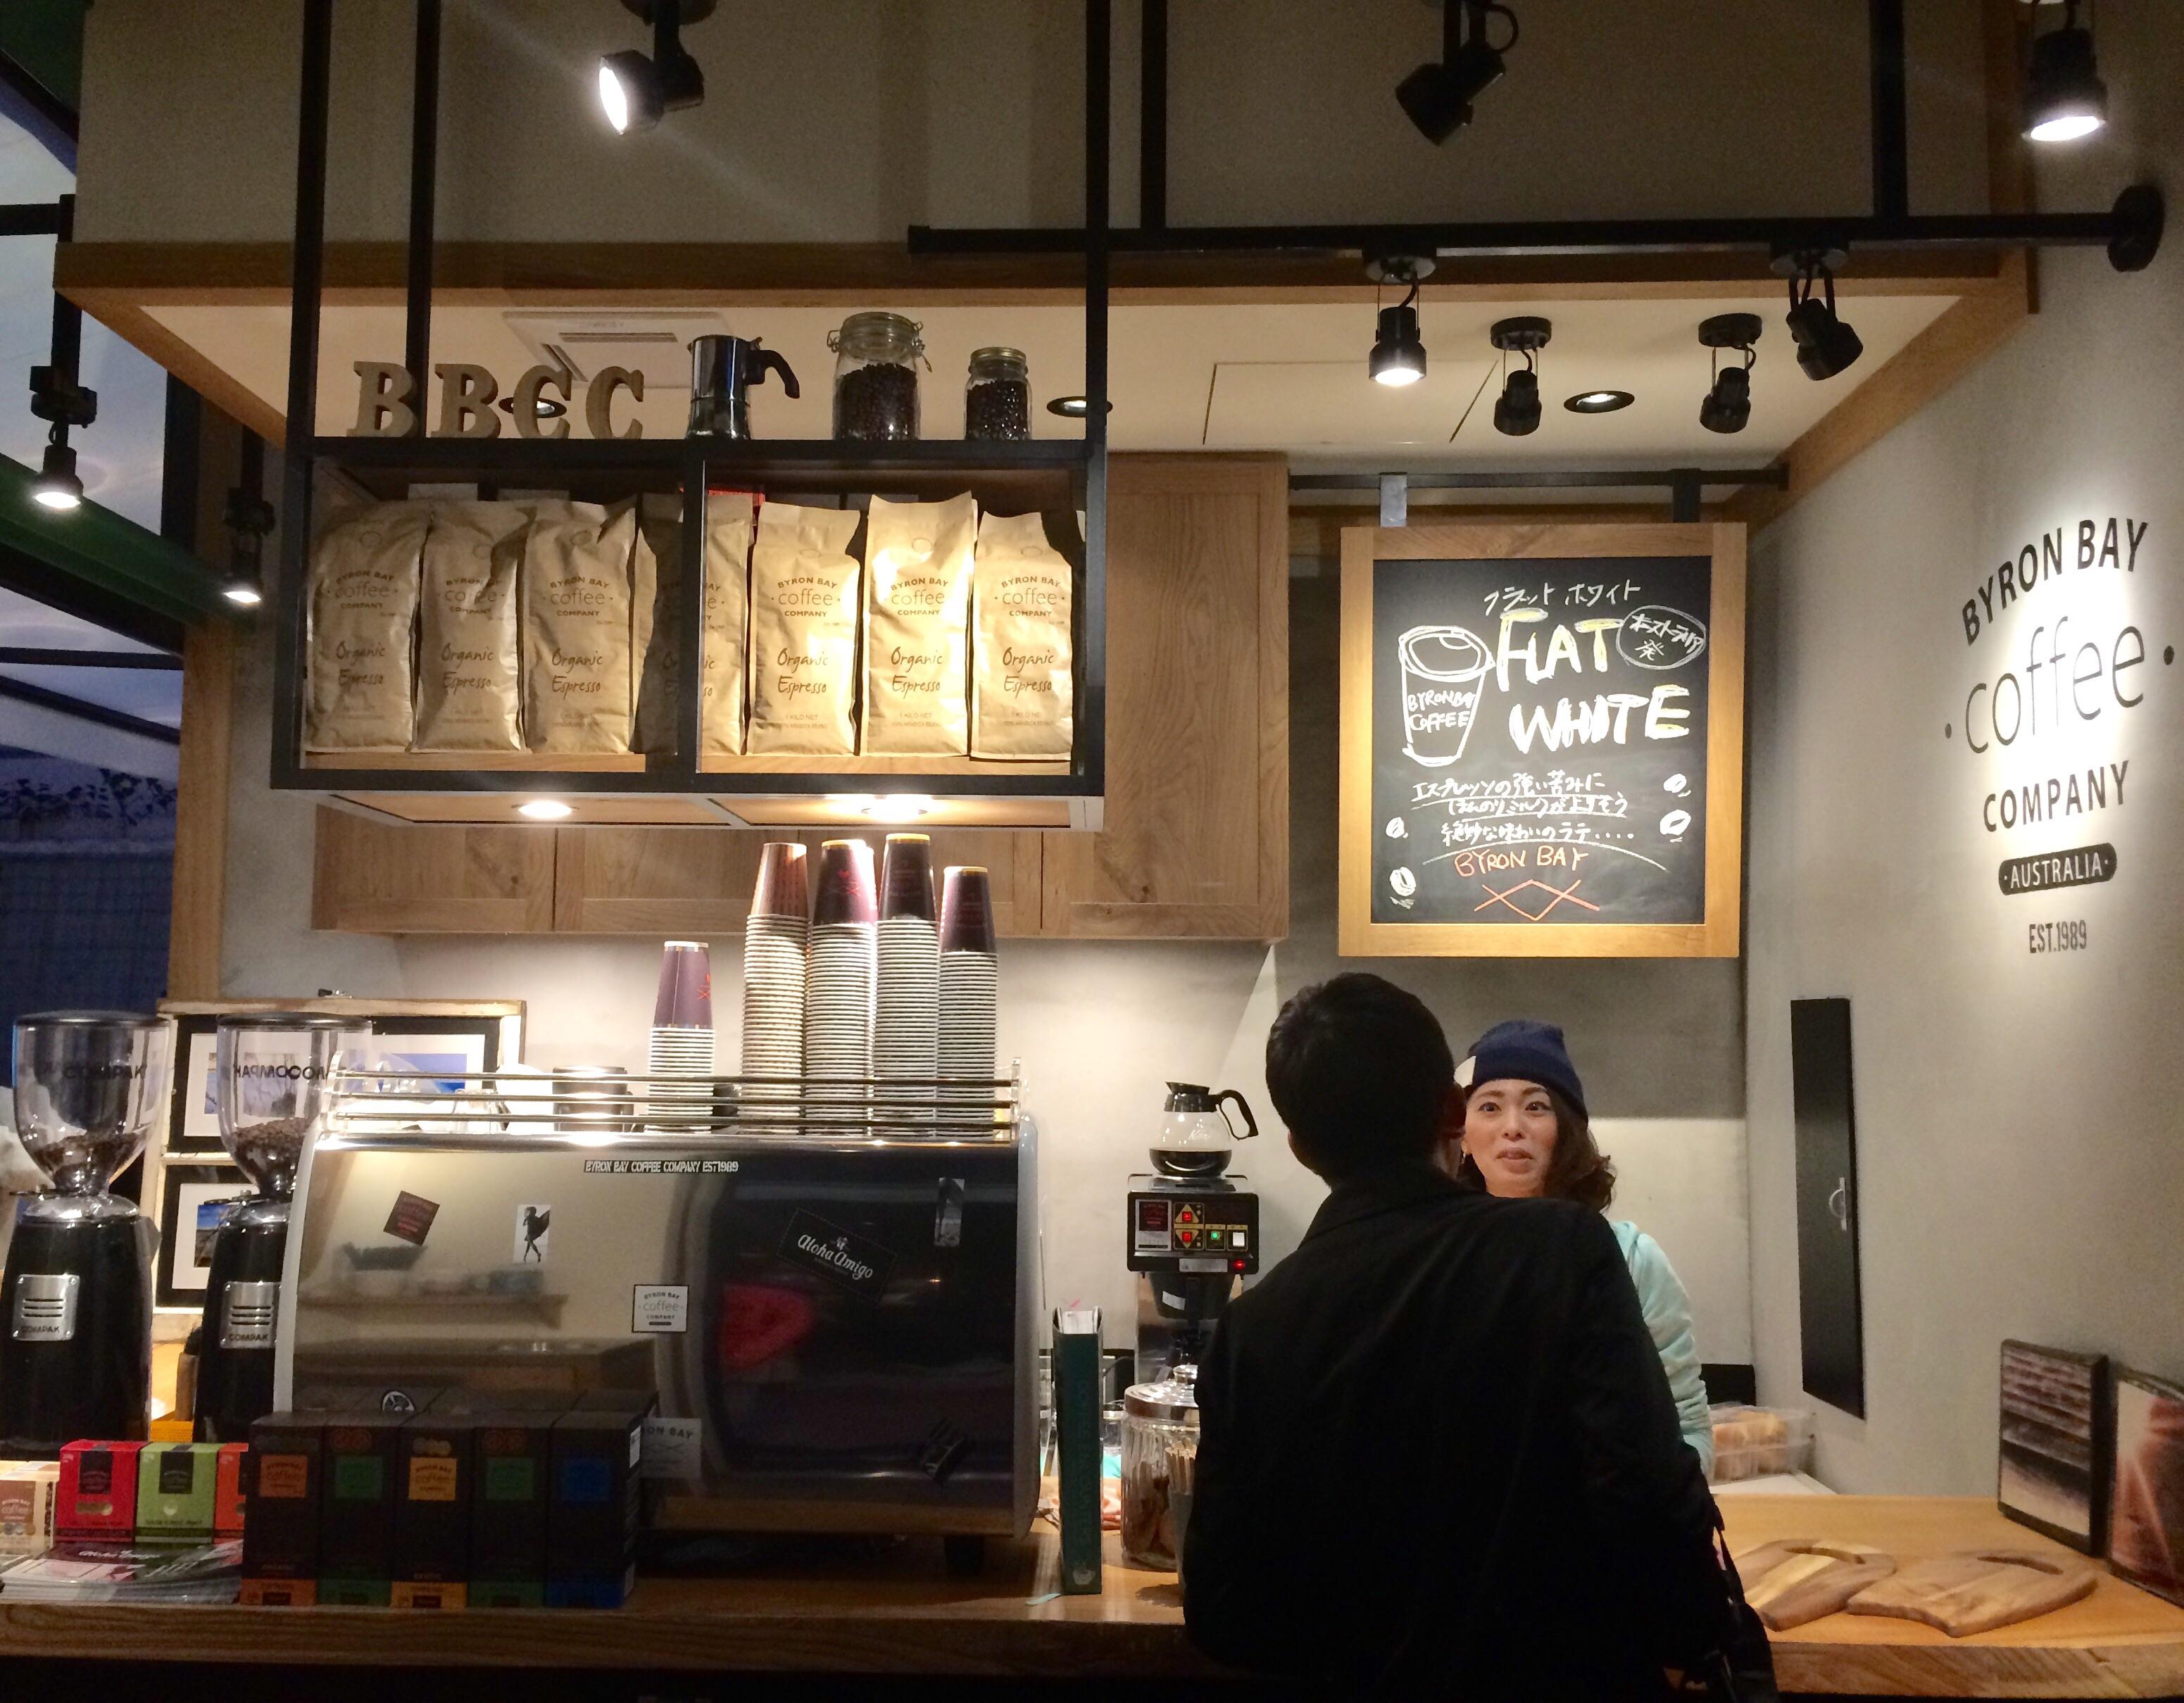 『BYRON BAY COFFEE』のオーガニックコーヒーで、素敵なひとときを過ごしませんか?_1